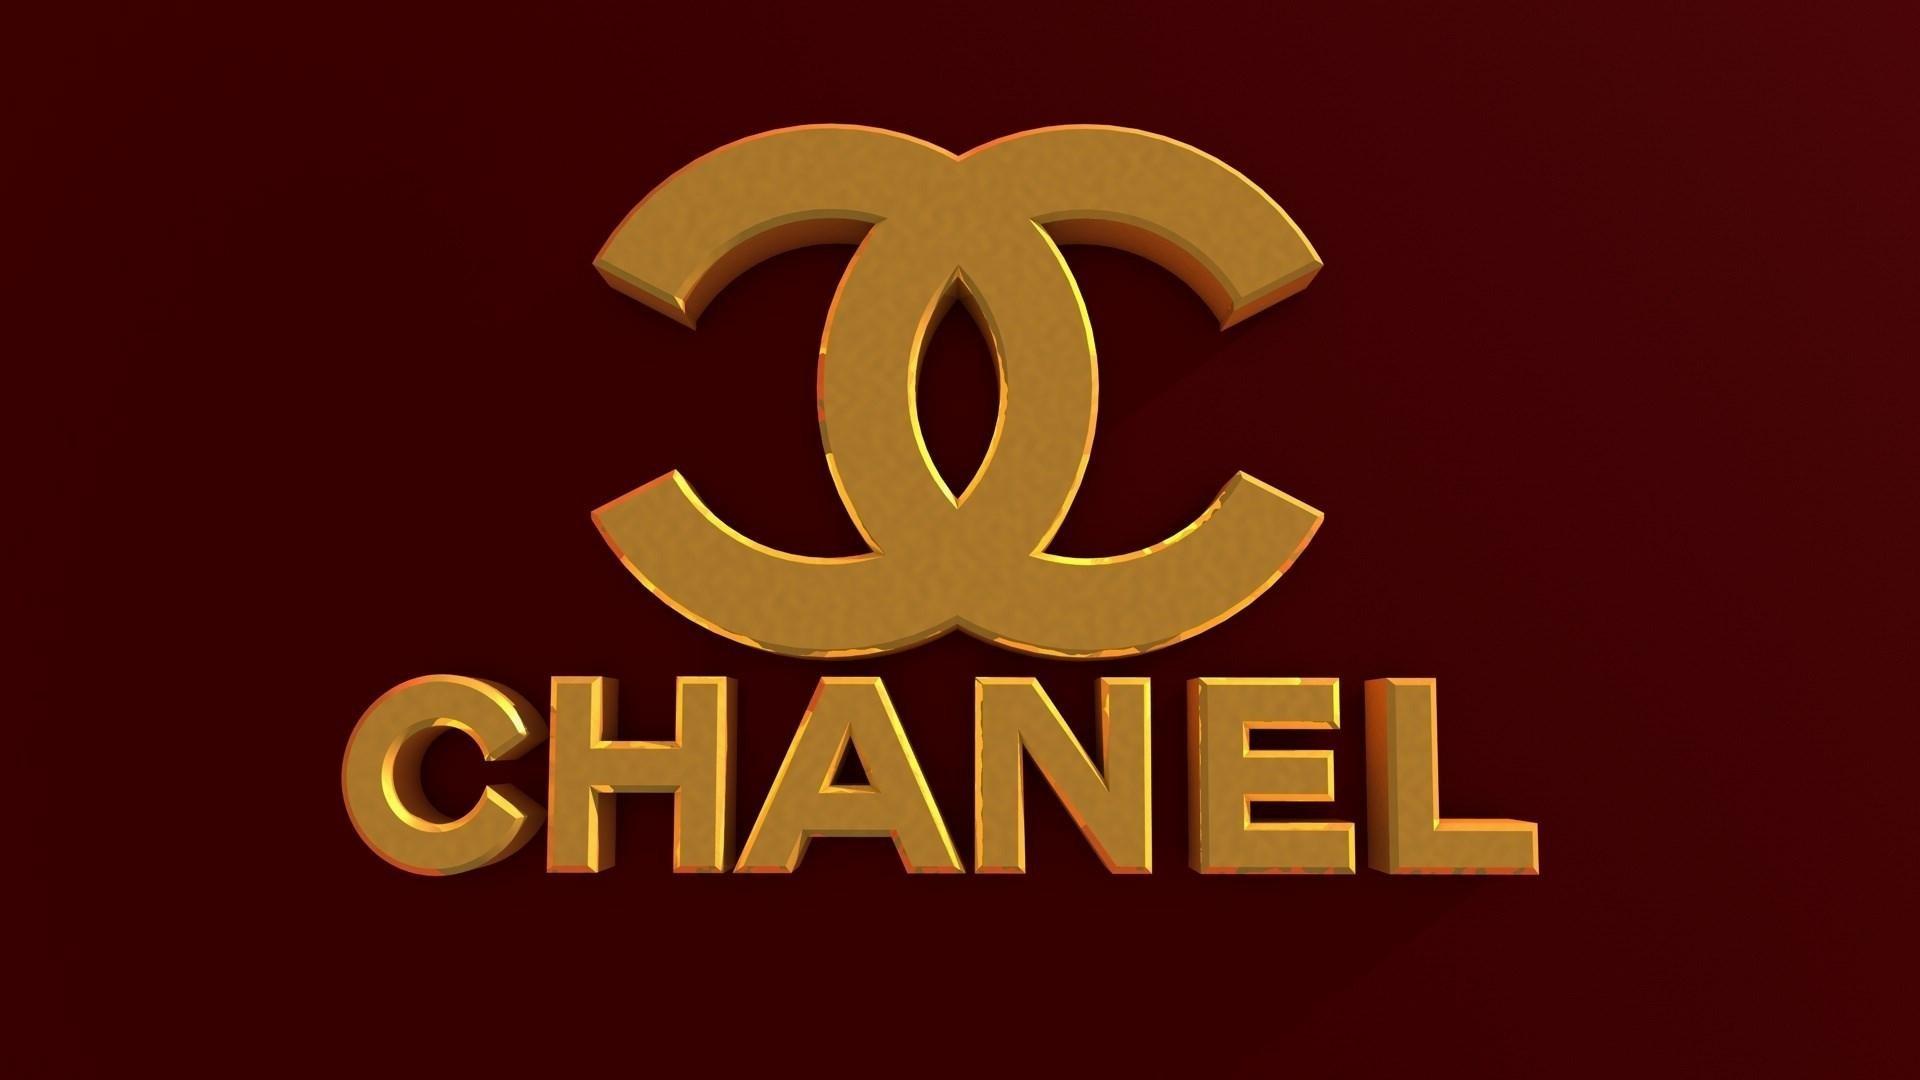 2048x1367 Chanel Wallpaper Iphone Pinteres